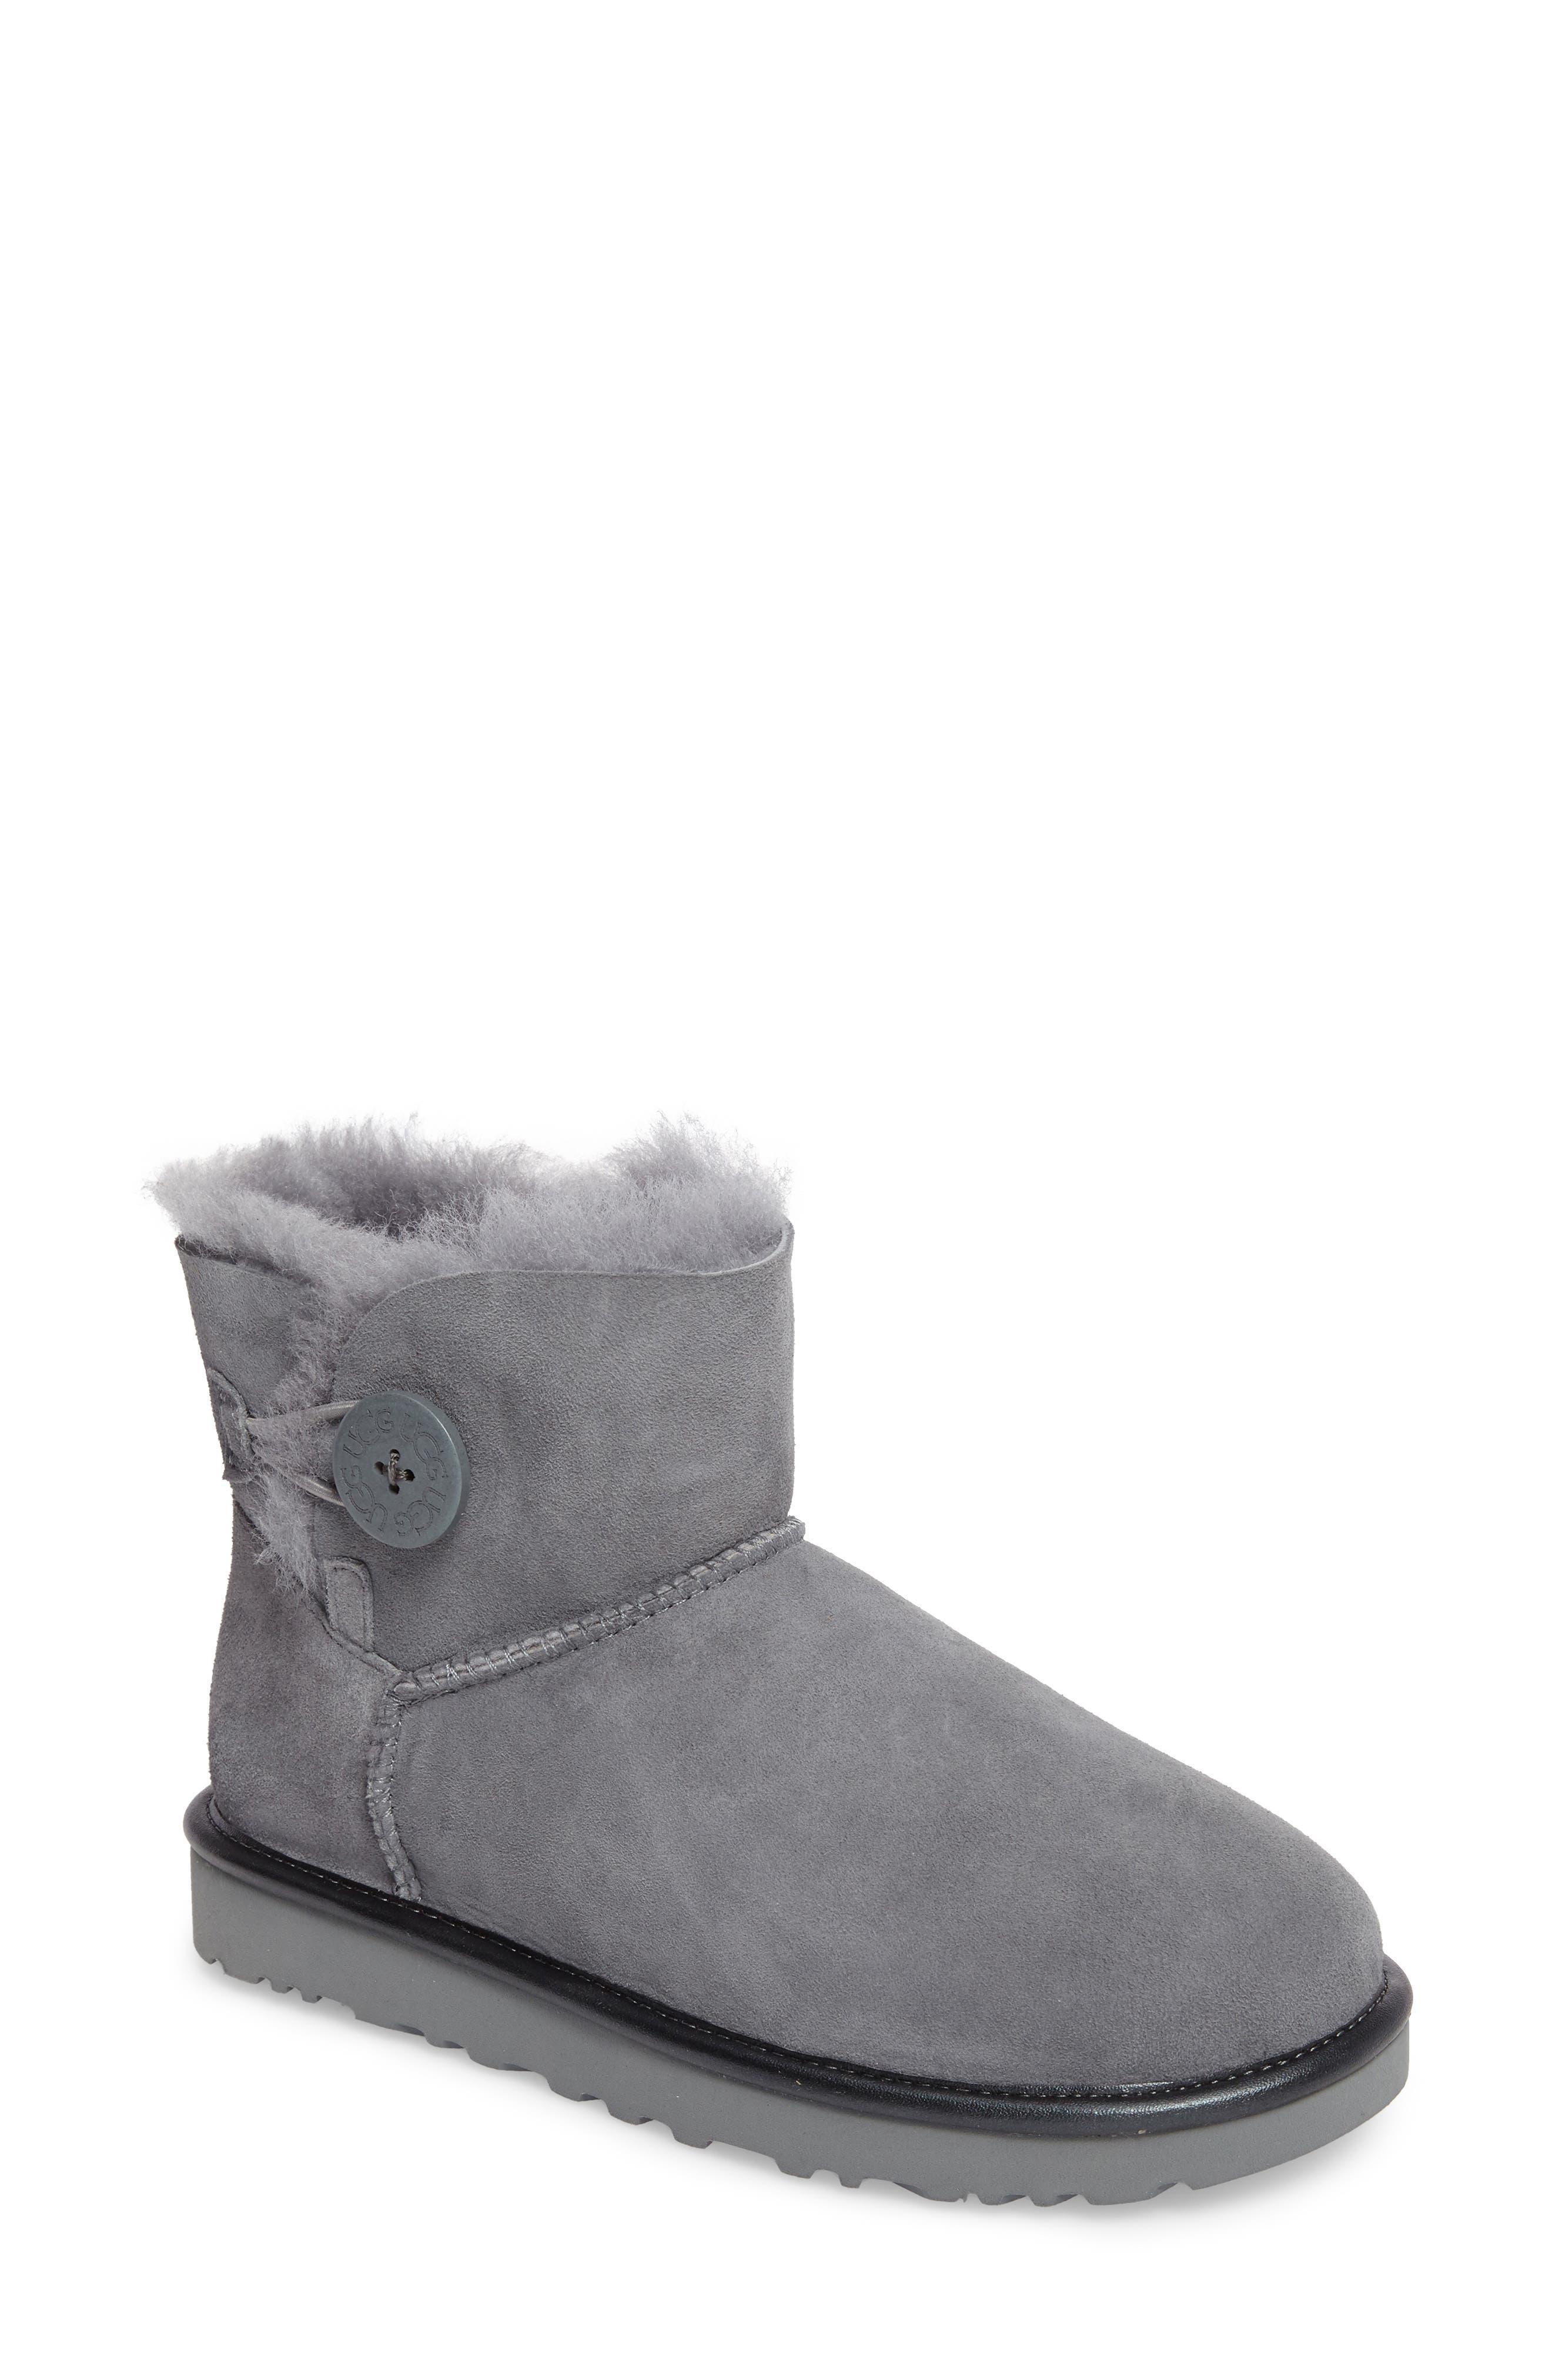 ugg womens mini bailey button boots chocolate milk rh w sander com